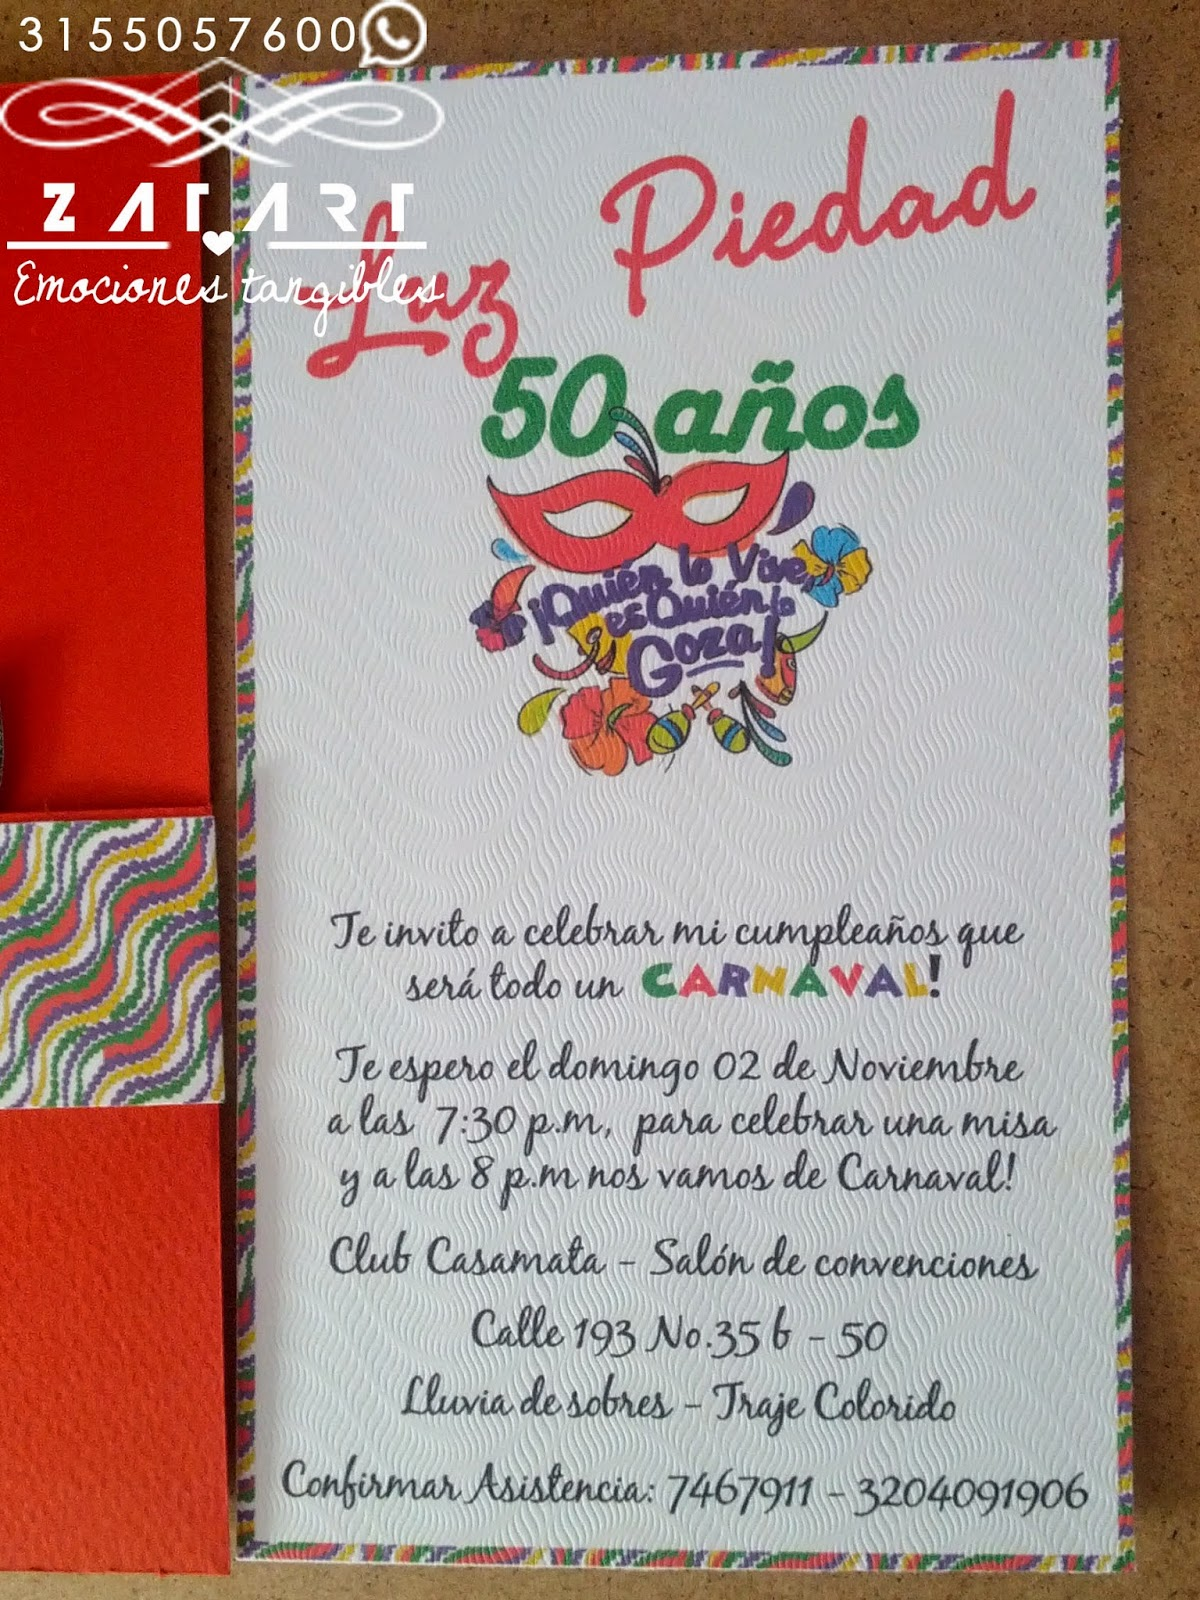 Frases Para Invitaciones 50 Anos Cumpleanos Centro De